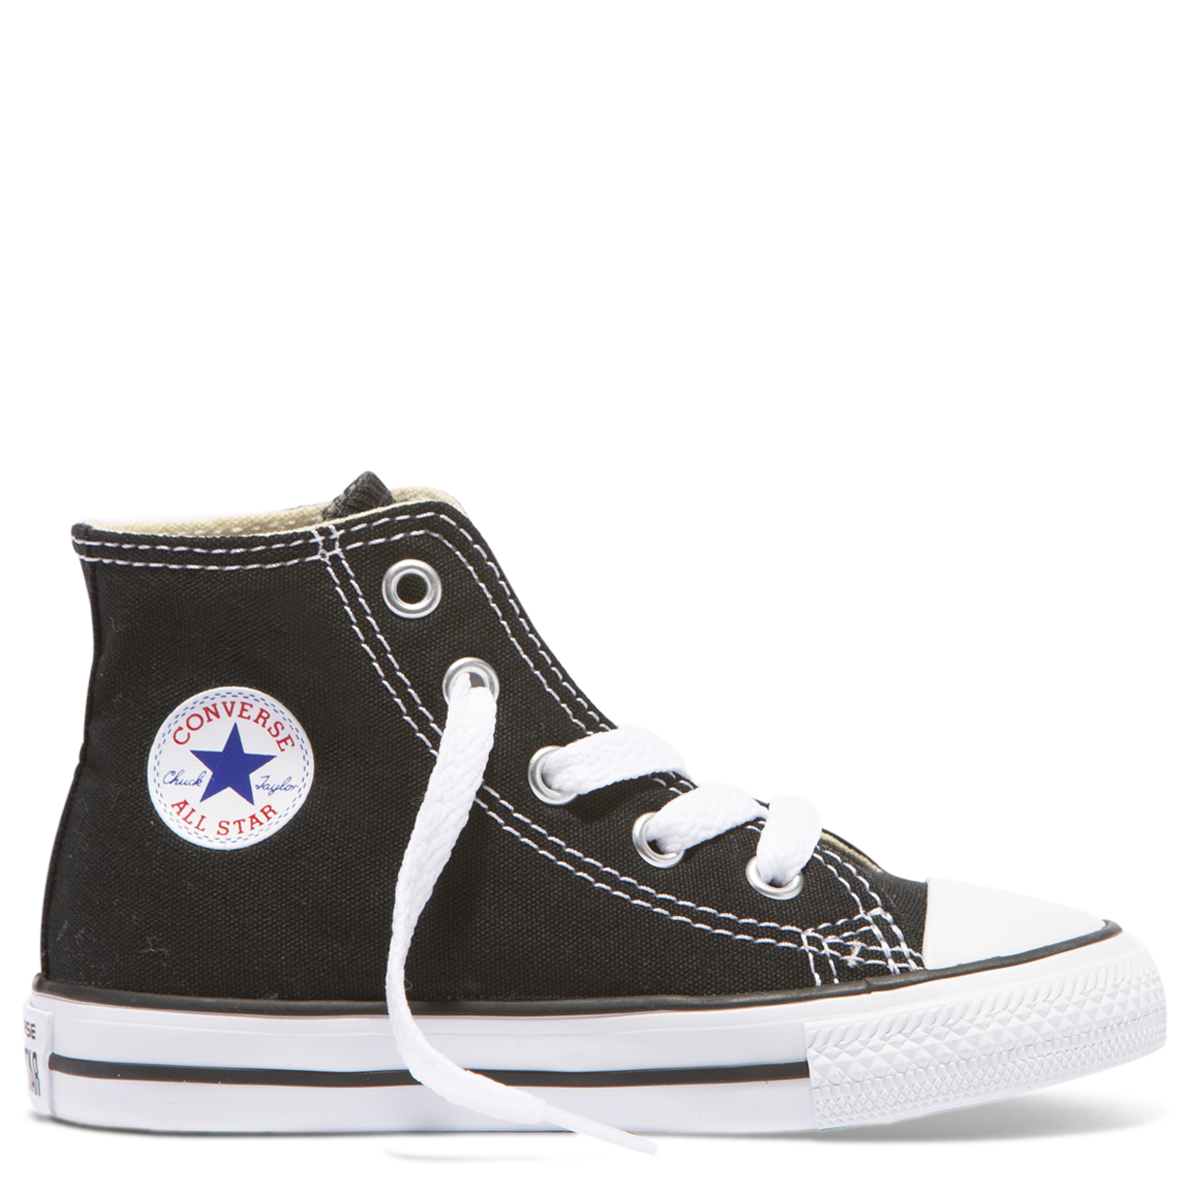 a07a84ae4ce73e Converse Chuck Taylor All Star Toddler High Top - Black. Price   49.99.  Image 1